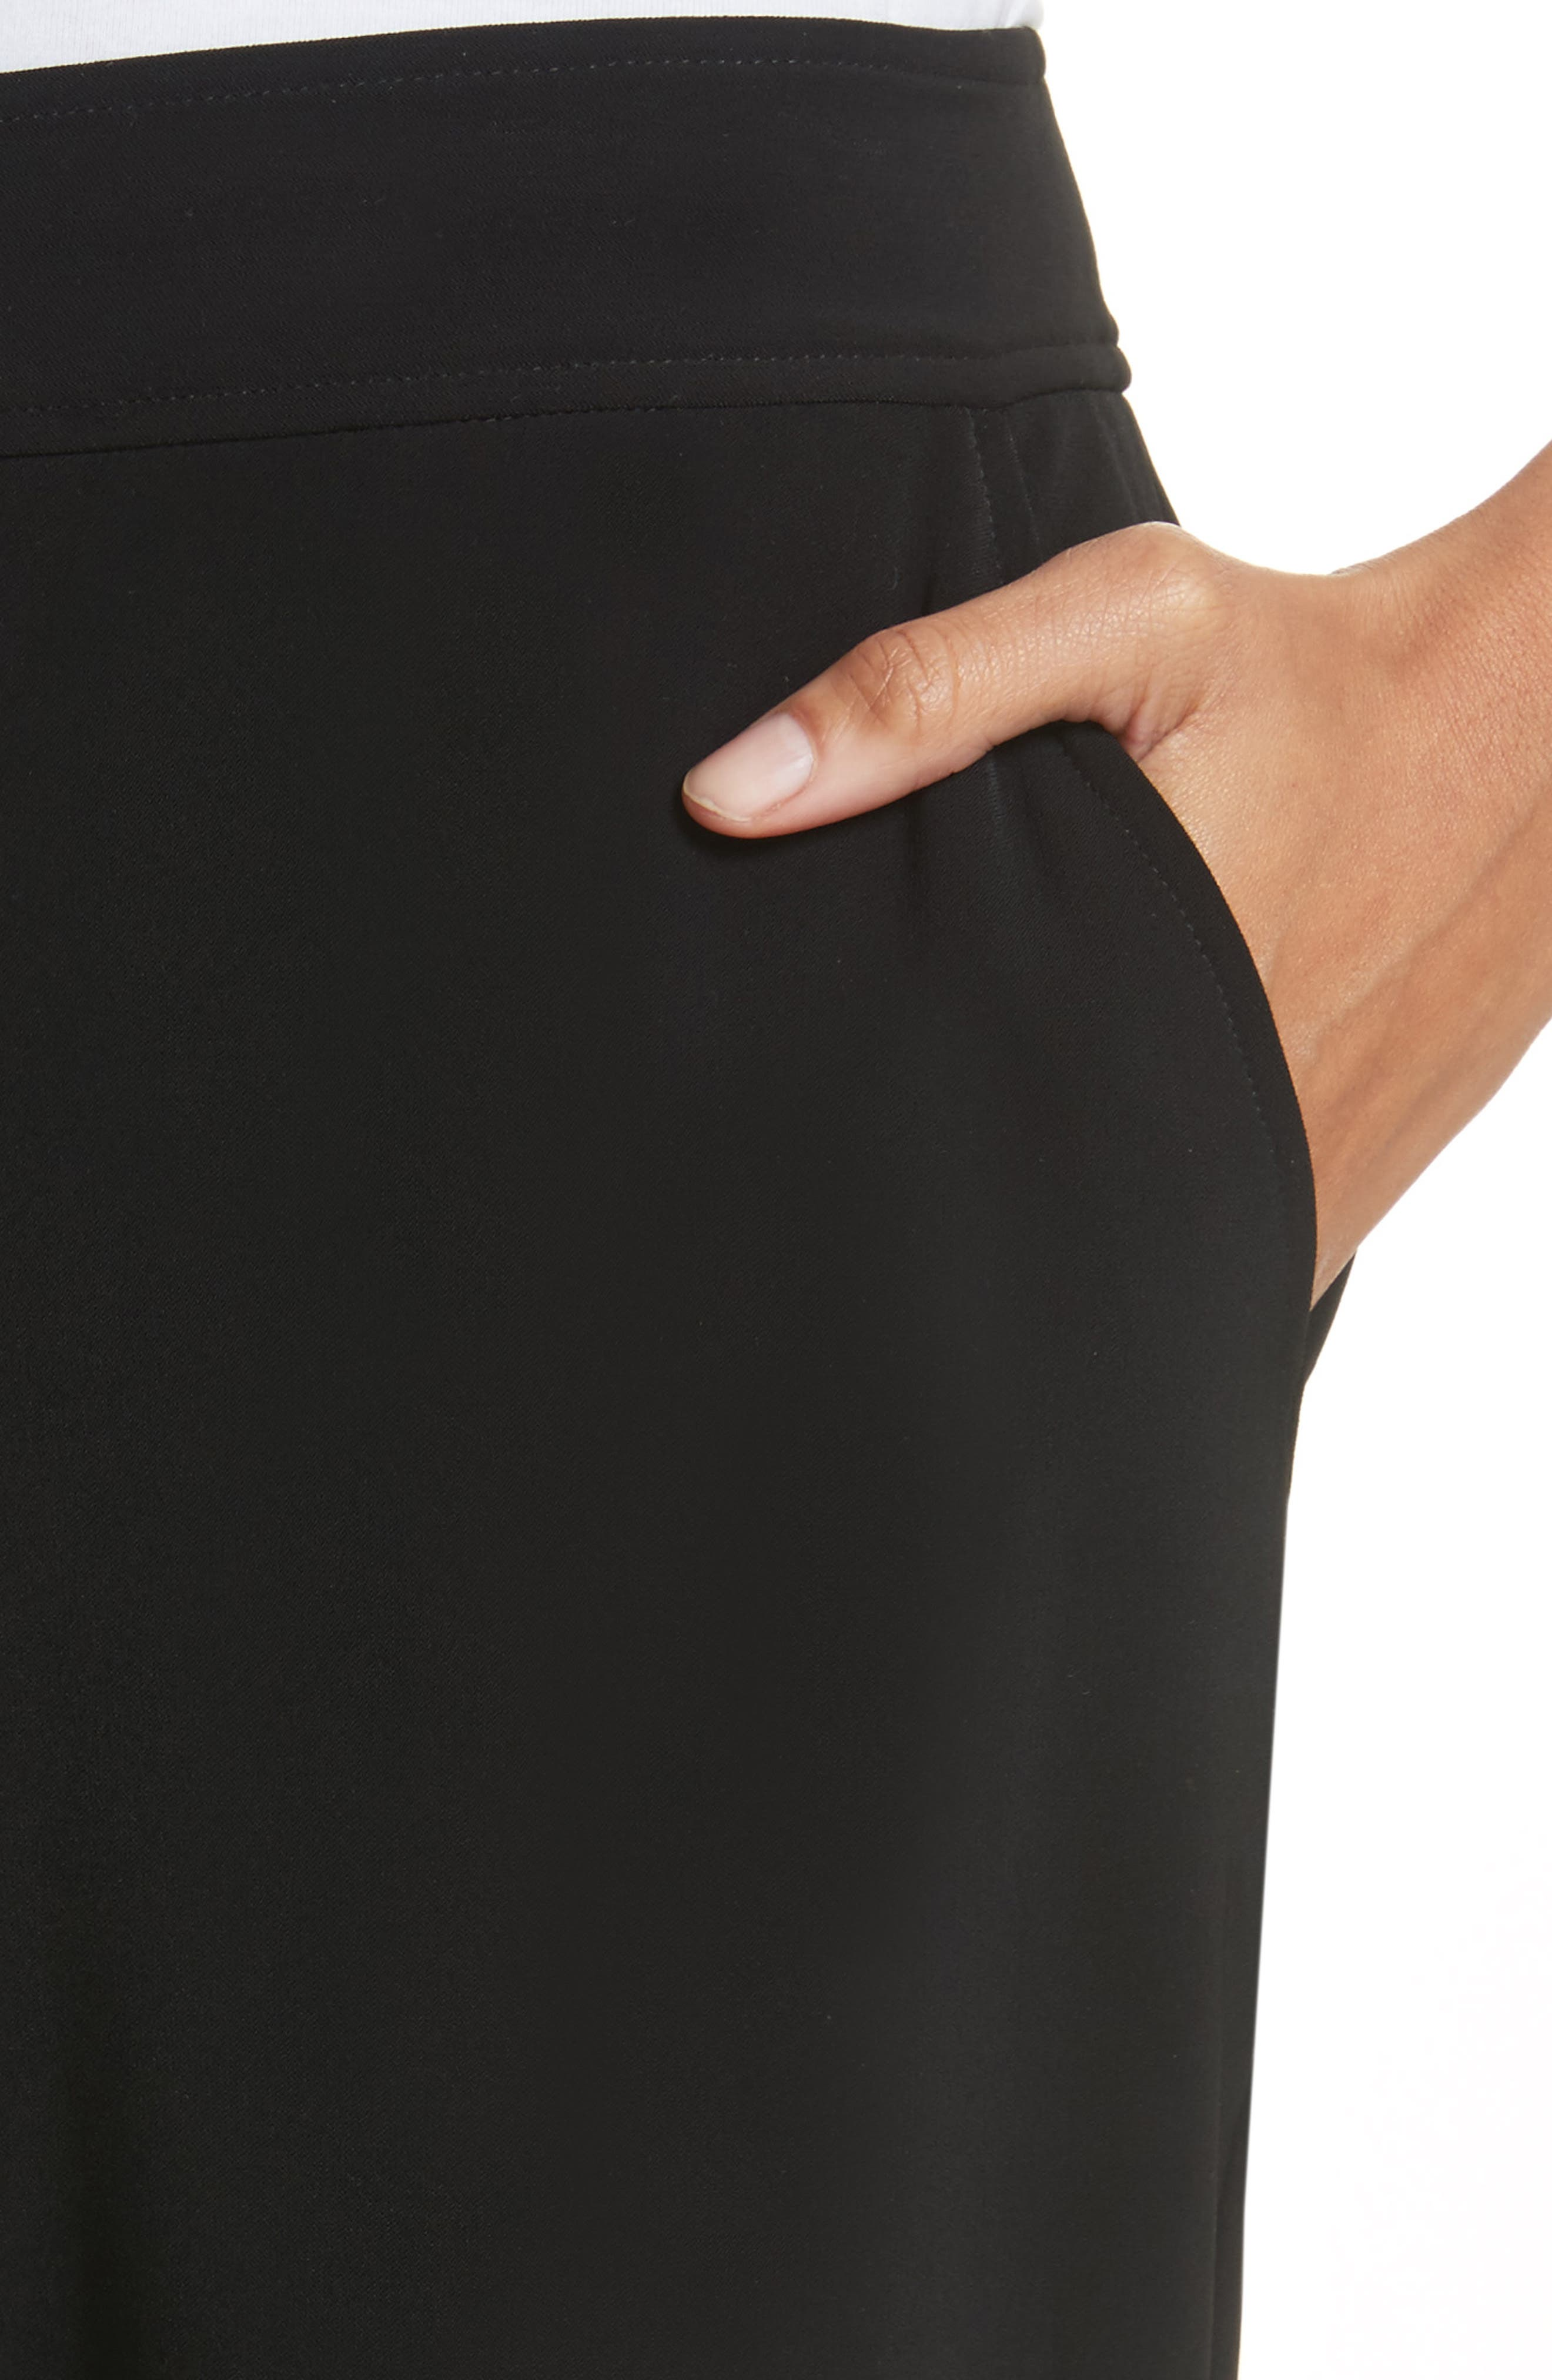 Yulit High Waist Trousers,                             Alternate thumbnail 4, color,                             001